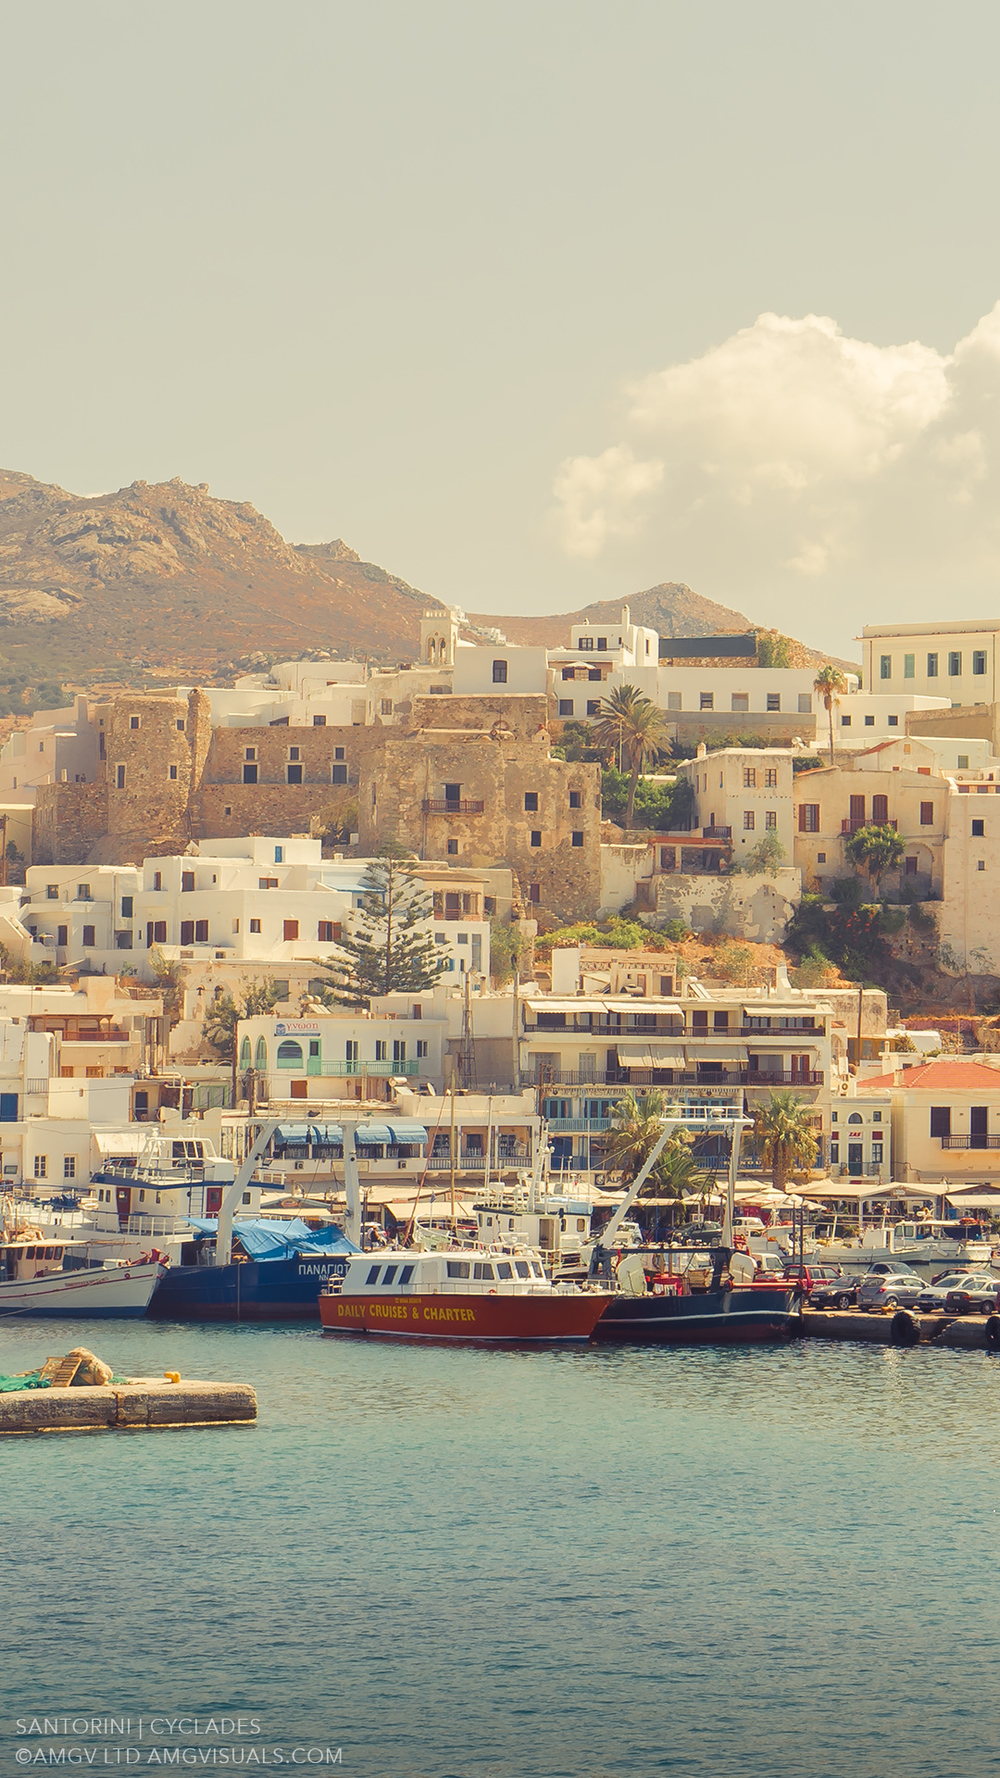 ©AMGV-LTD-Santorini+Cyclades-13.jpg